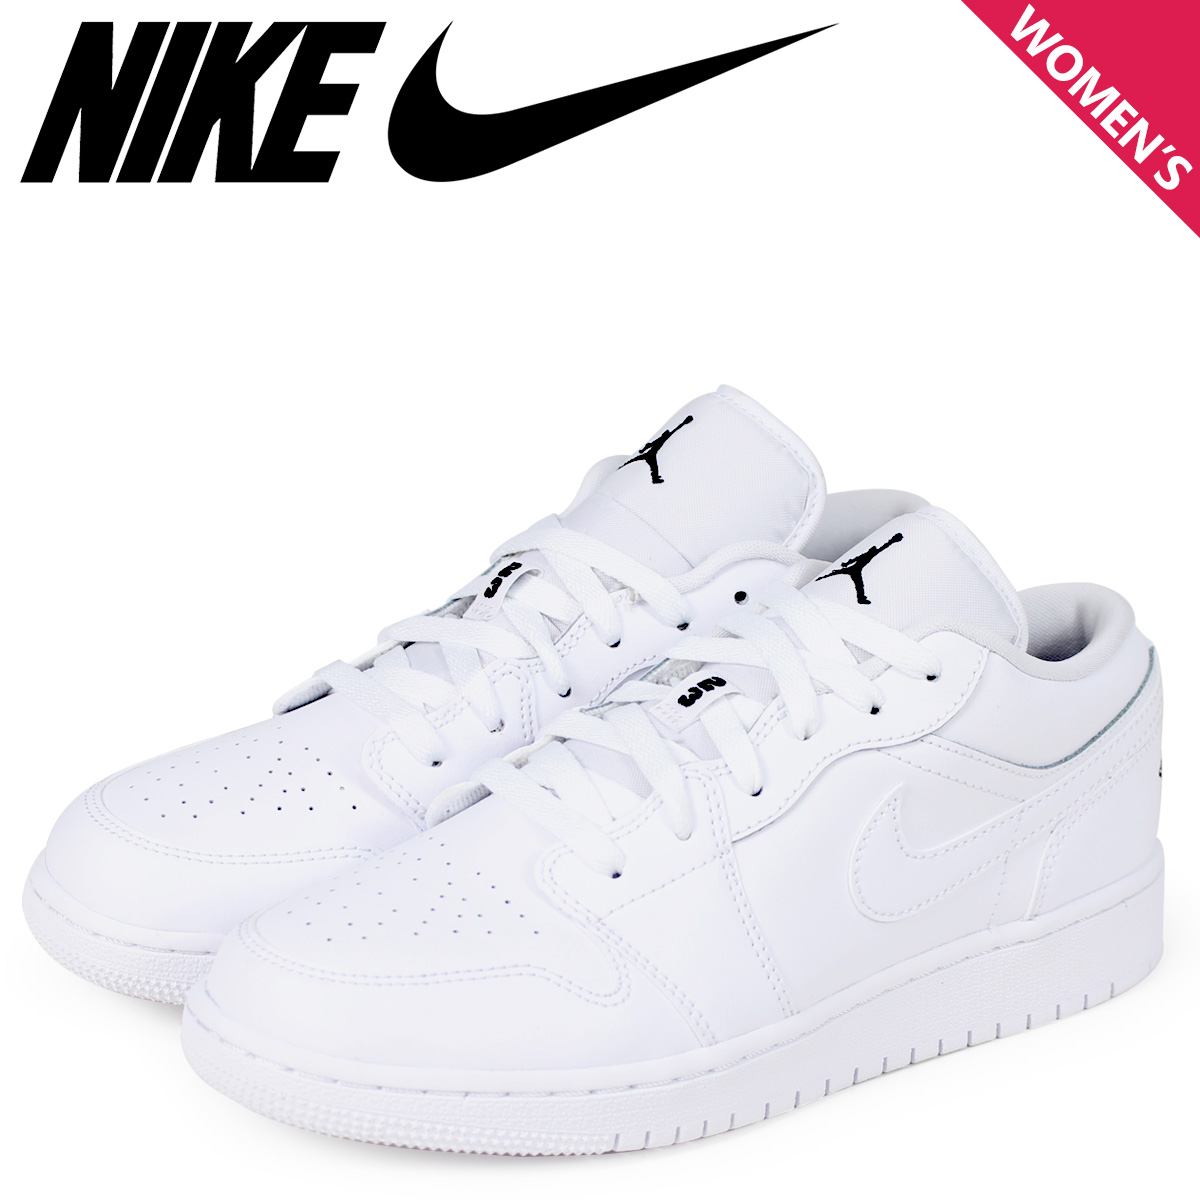 huge selection of af944 d6fd9 NIKE Nike Air Jordan 1 LOW Lady s sneakers AIR JORDAN 1 BG 553,560-101  shoes white  1 9 Shinnyu load